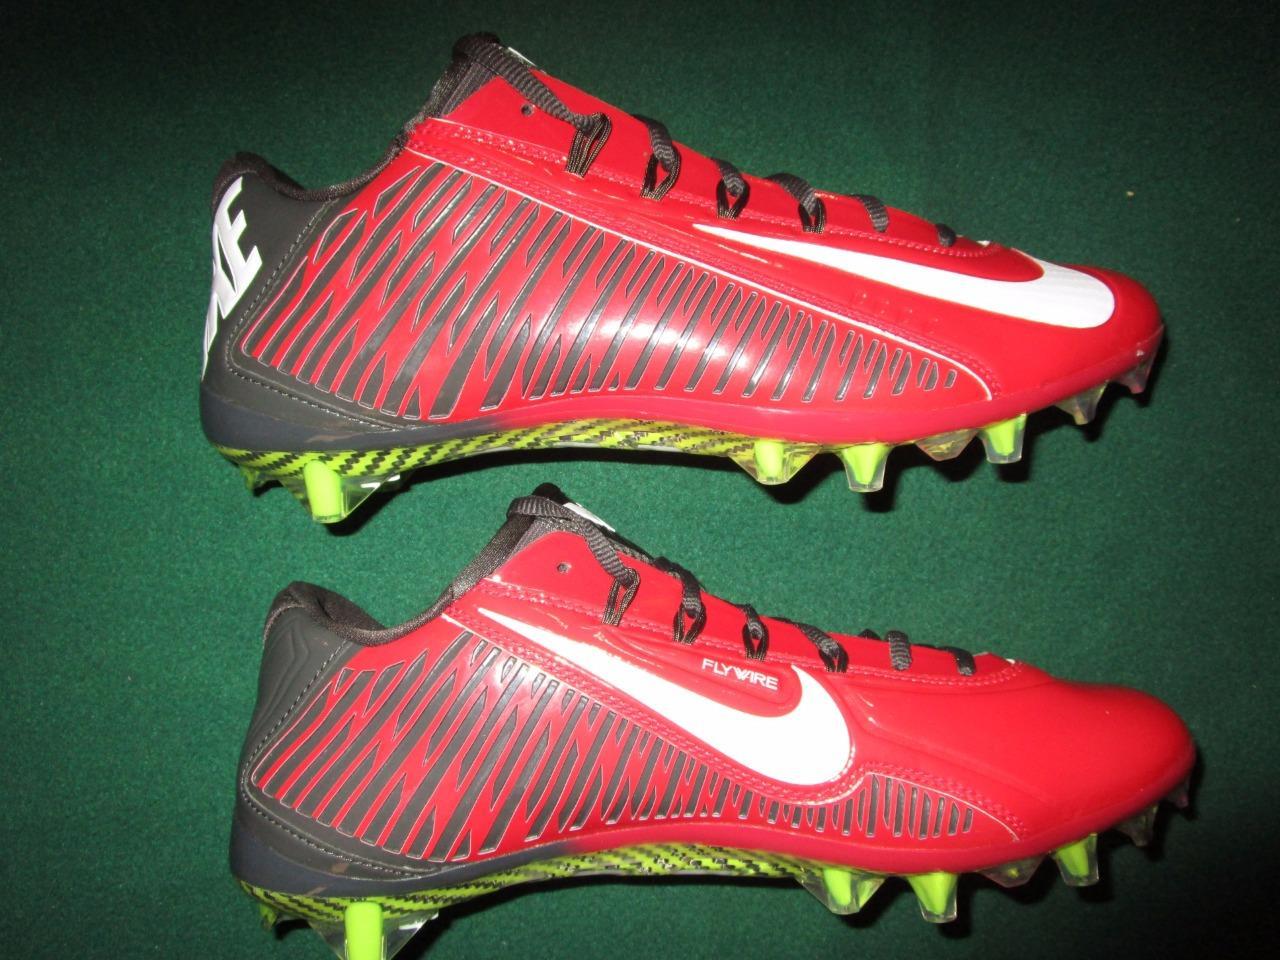 Nike-Vapor-Carbon-Elite-2014-TD-PF-Football-